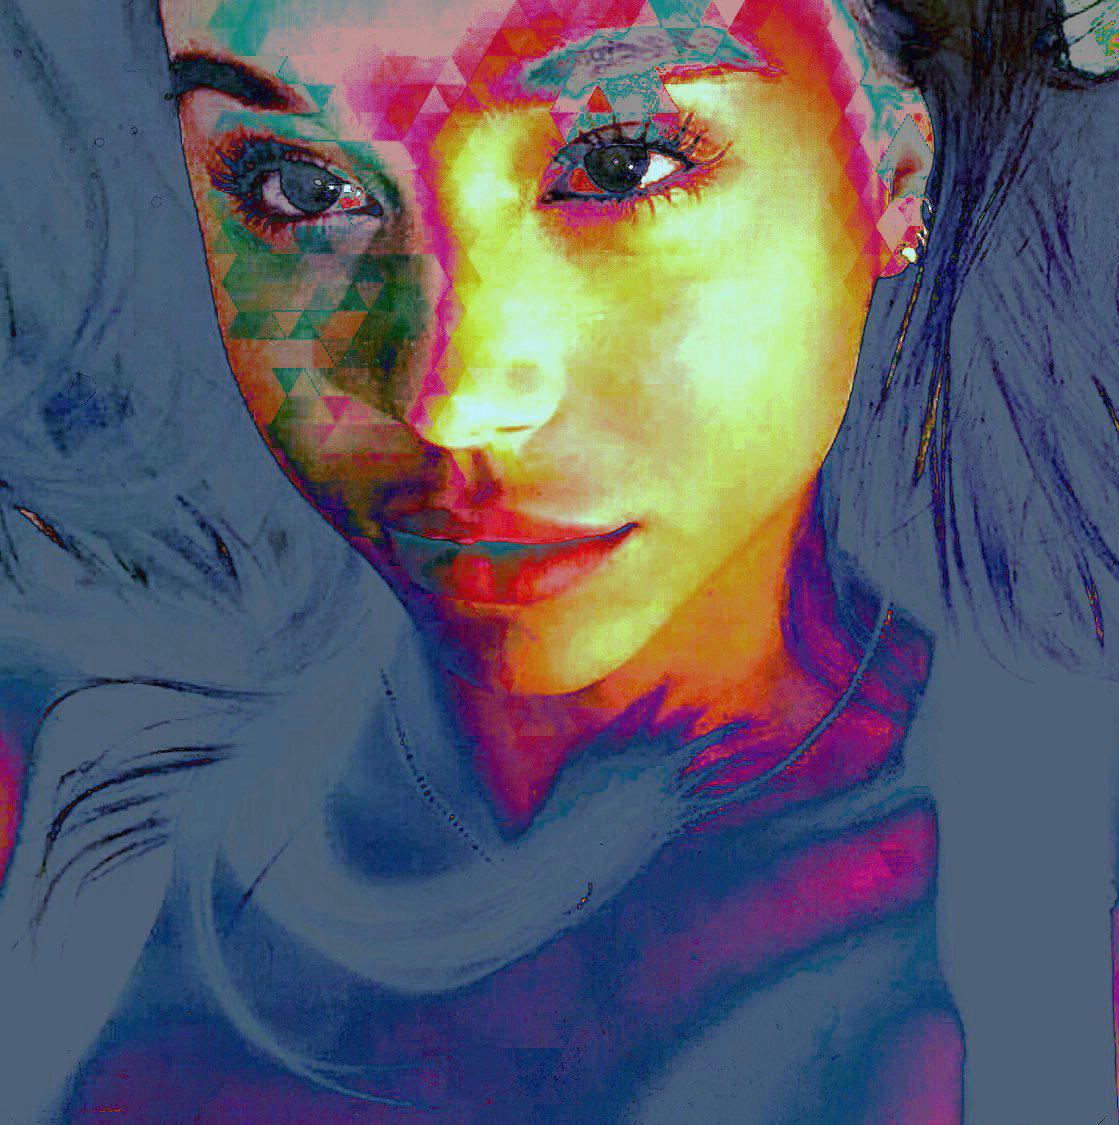 glitch girl face 2.jpg